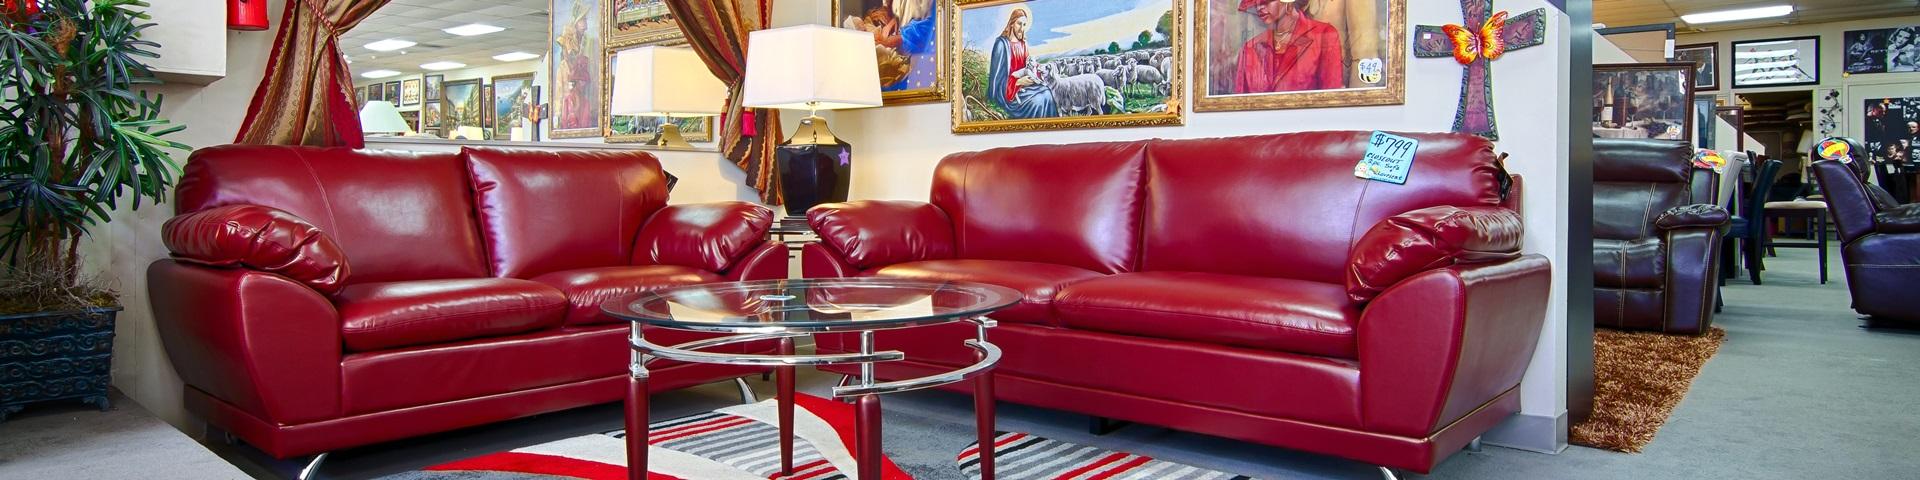 Furniture Stores In Dallas Tx Discount Furniture Stores Dallas Images Interior Decorating How